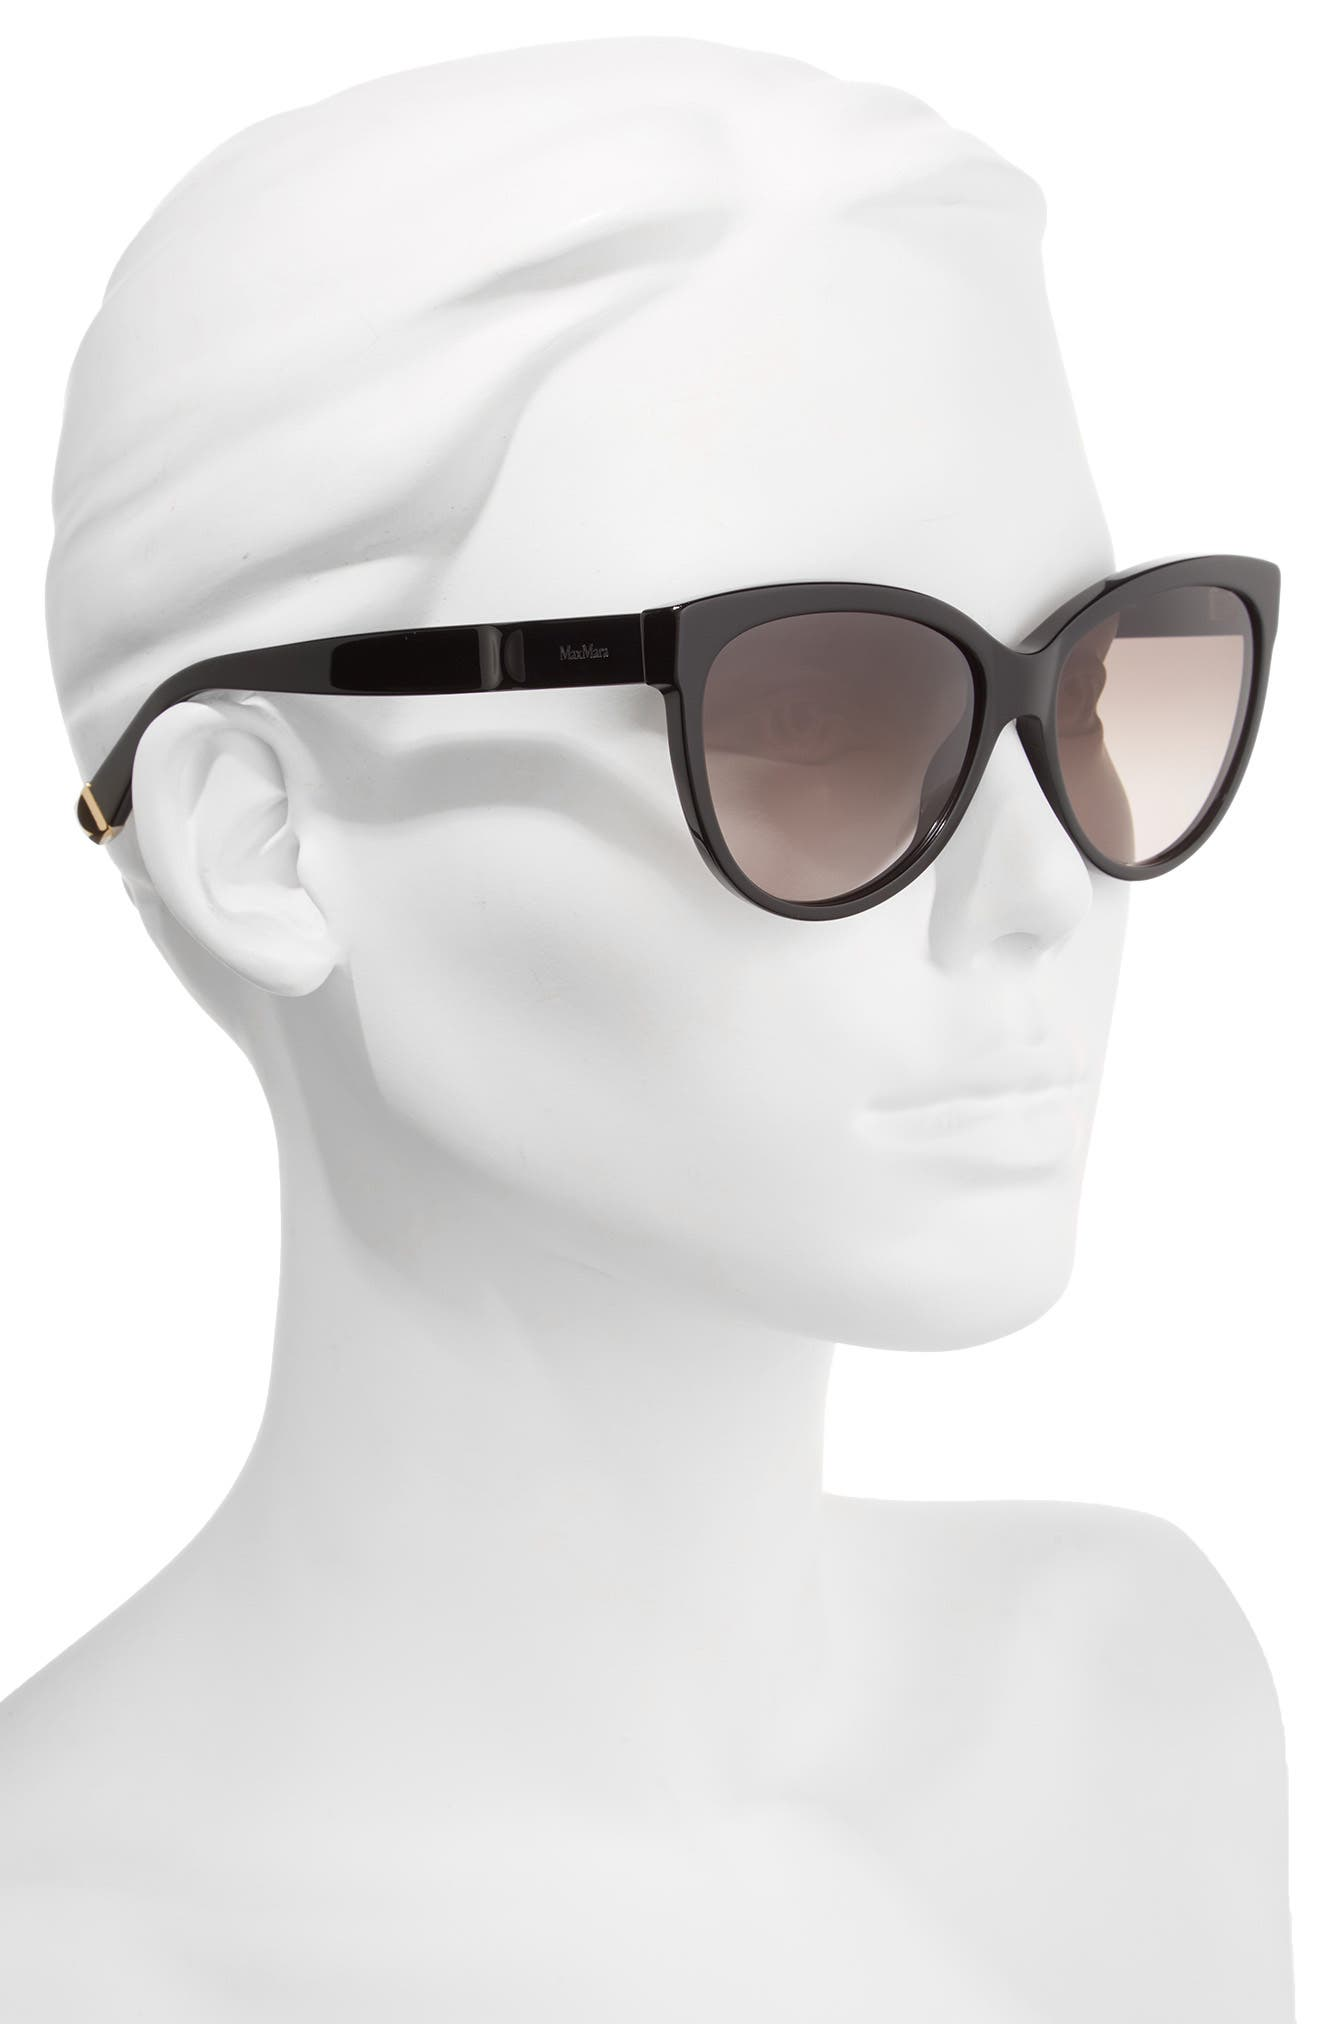 Moderii 57mm Gradient Cat Eye Sunglasses,                             Alternate thumbnail 3, color,